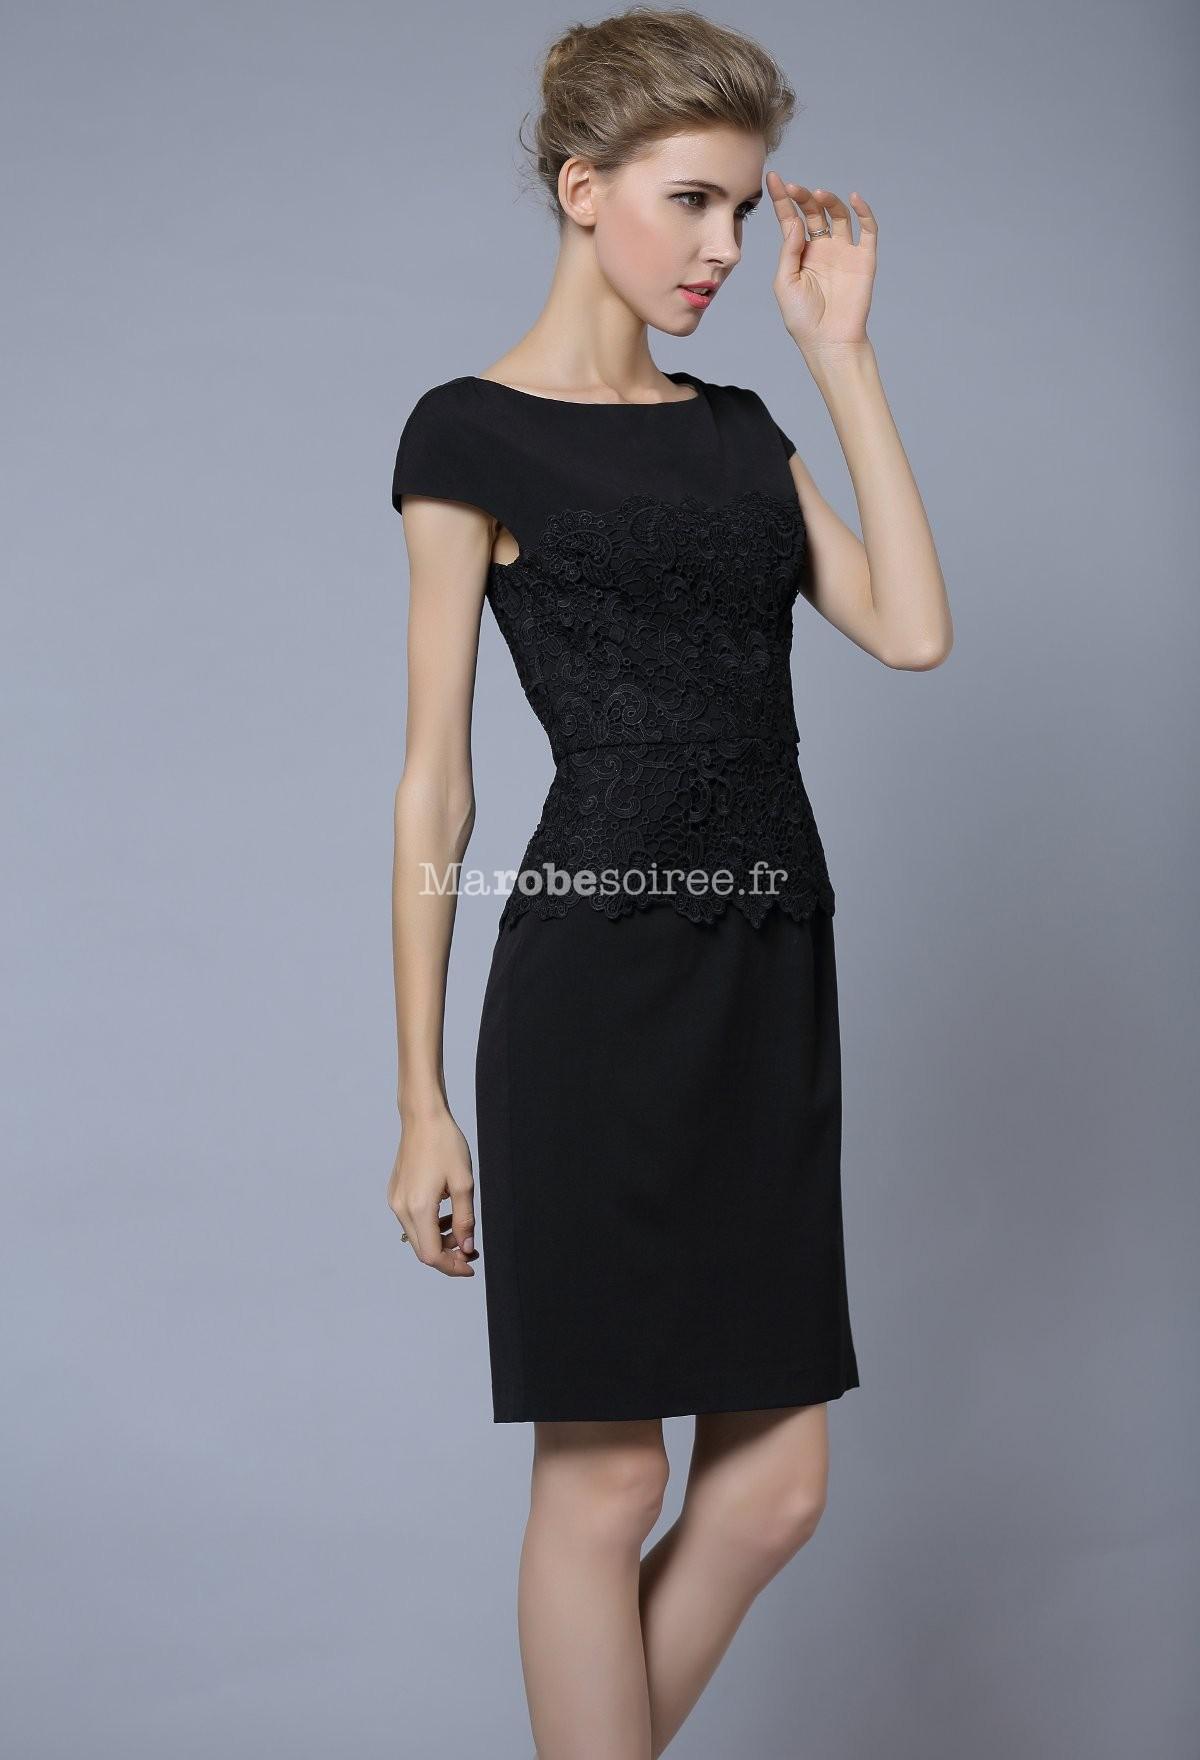 robe de cocktail courte taille marqu e dentelle. Black Bedroom Furniture Sets. Home Design Ideas